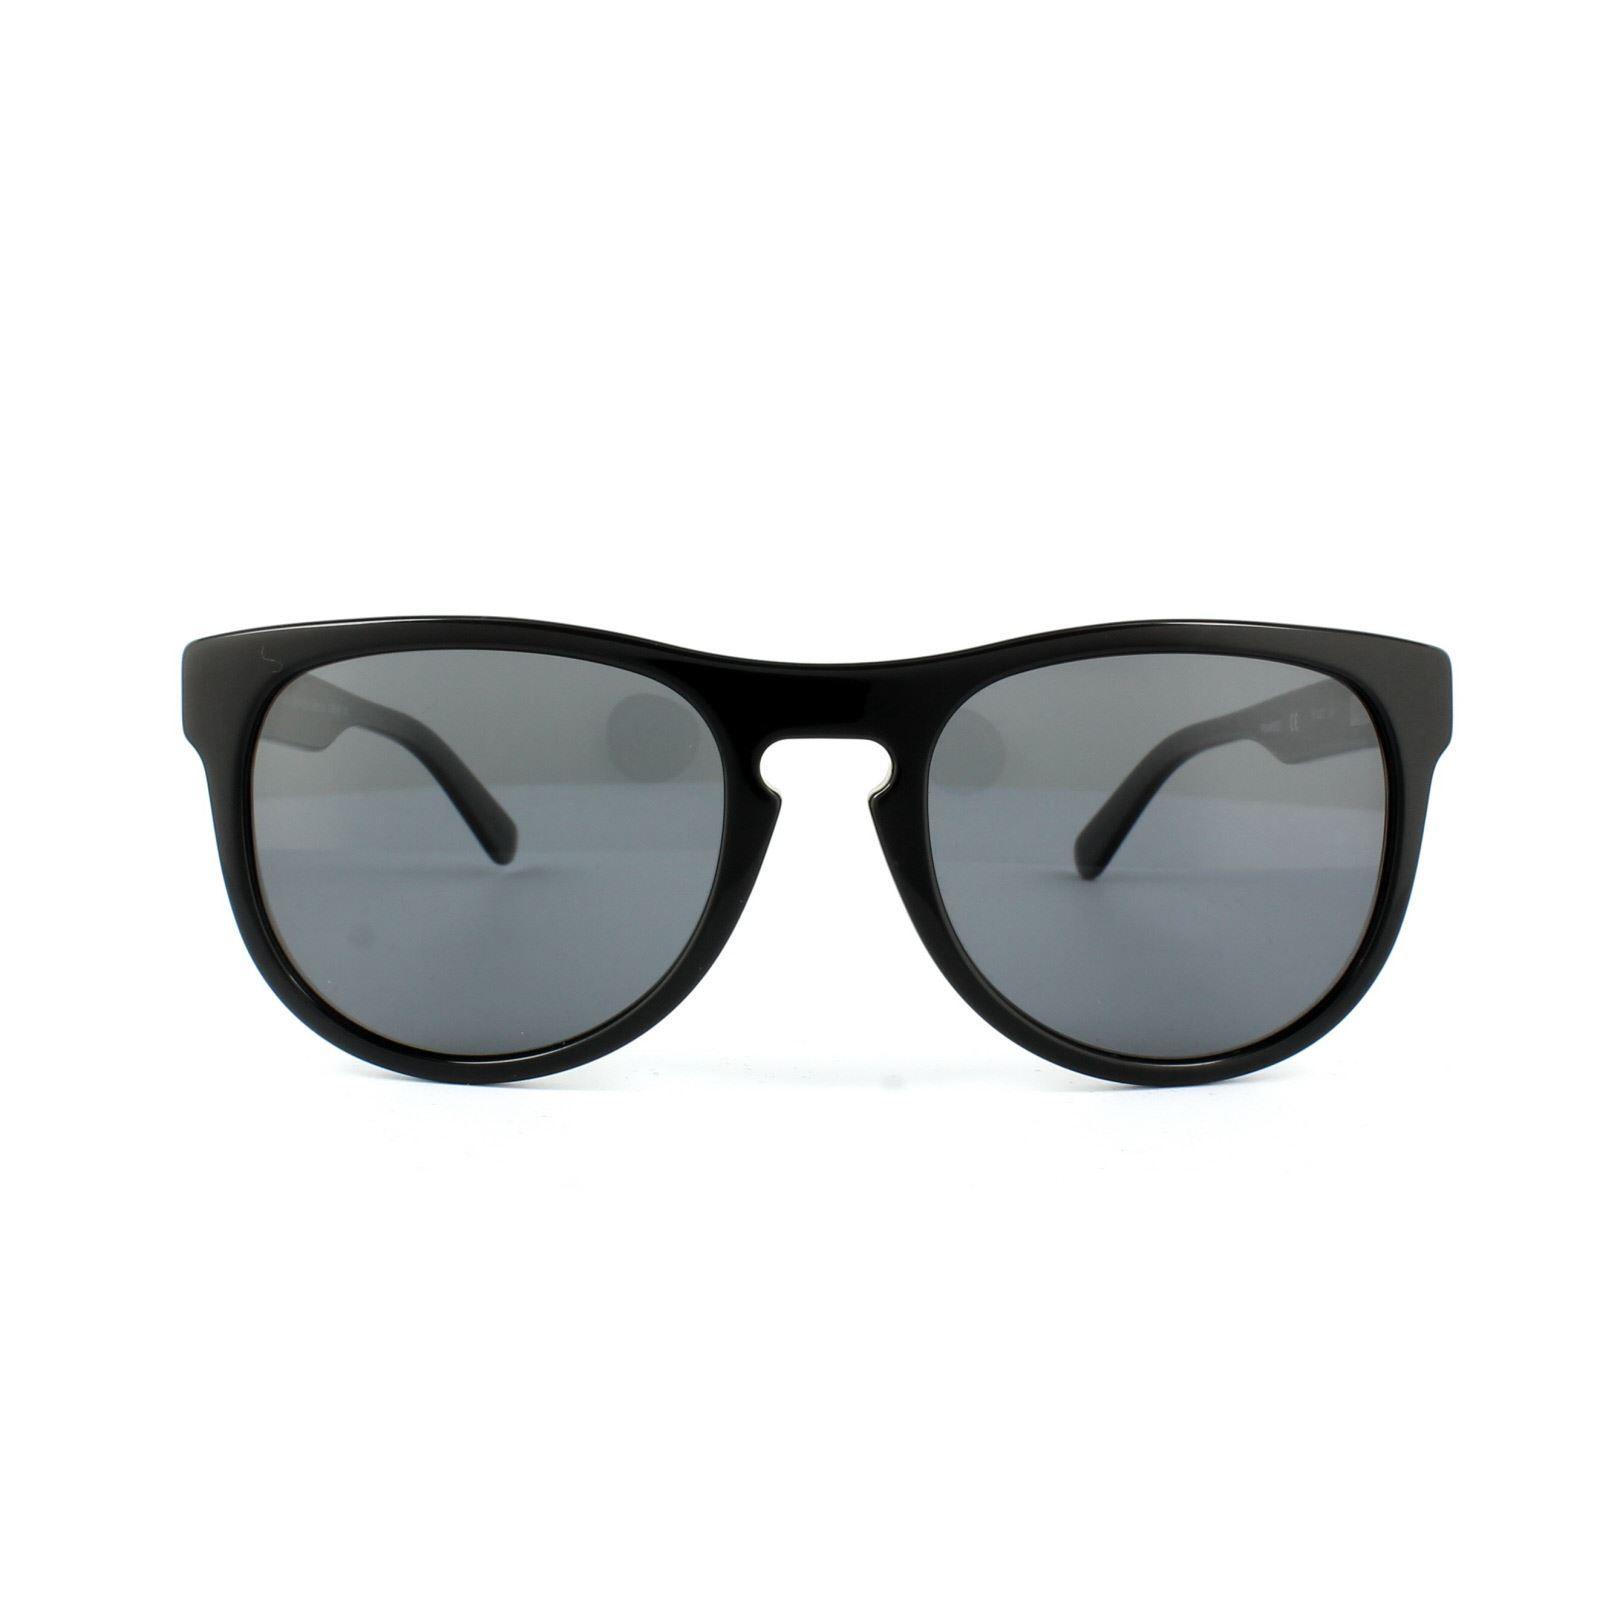 Calvin Klein Sunglasses CK7965SP 001 Black Grey Polarized